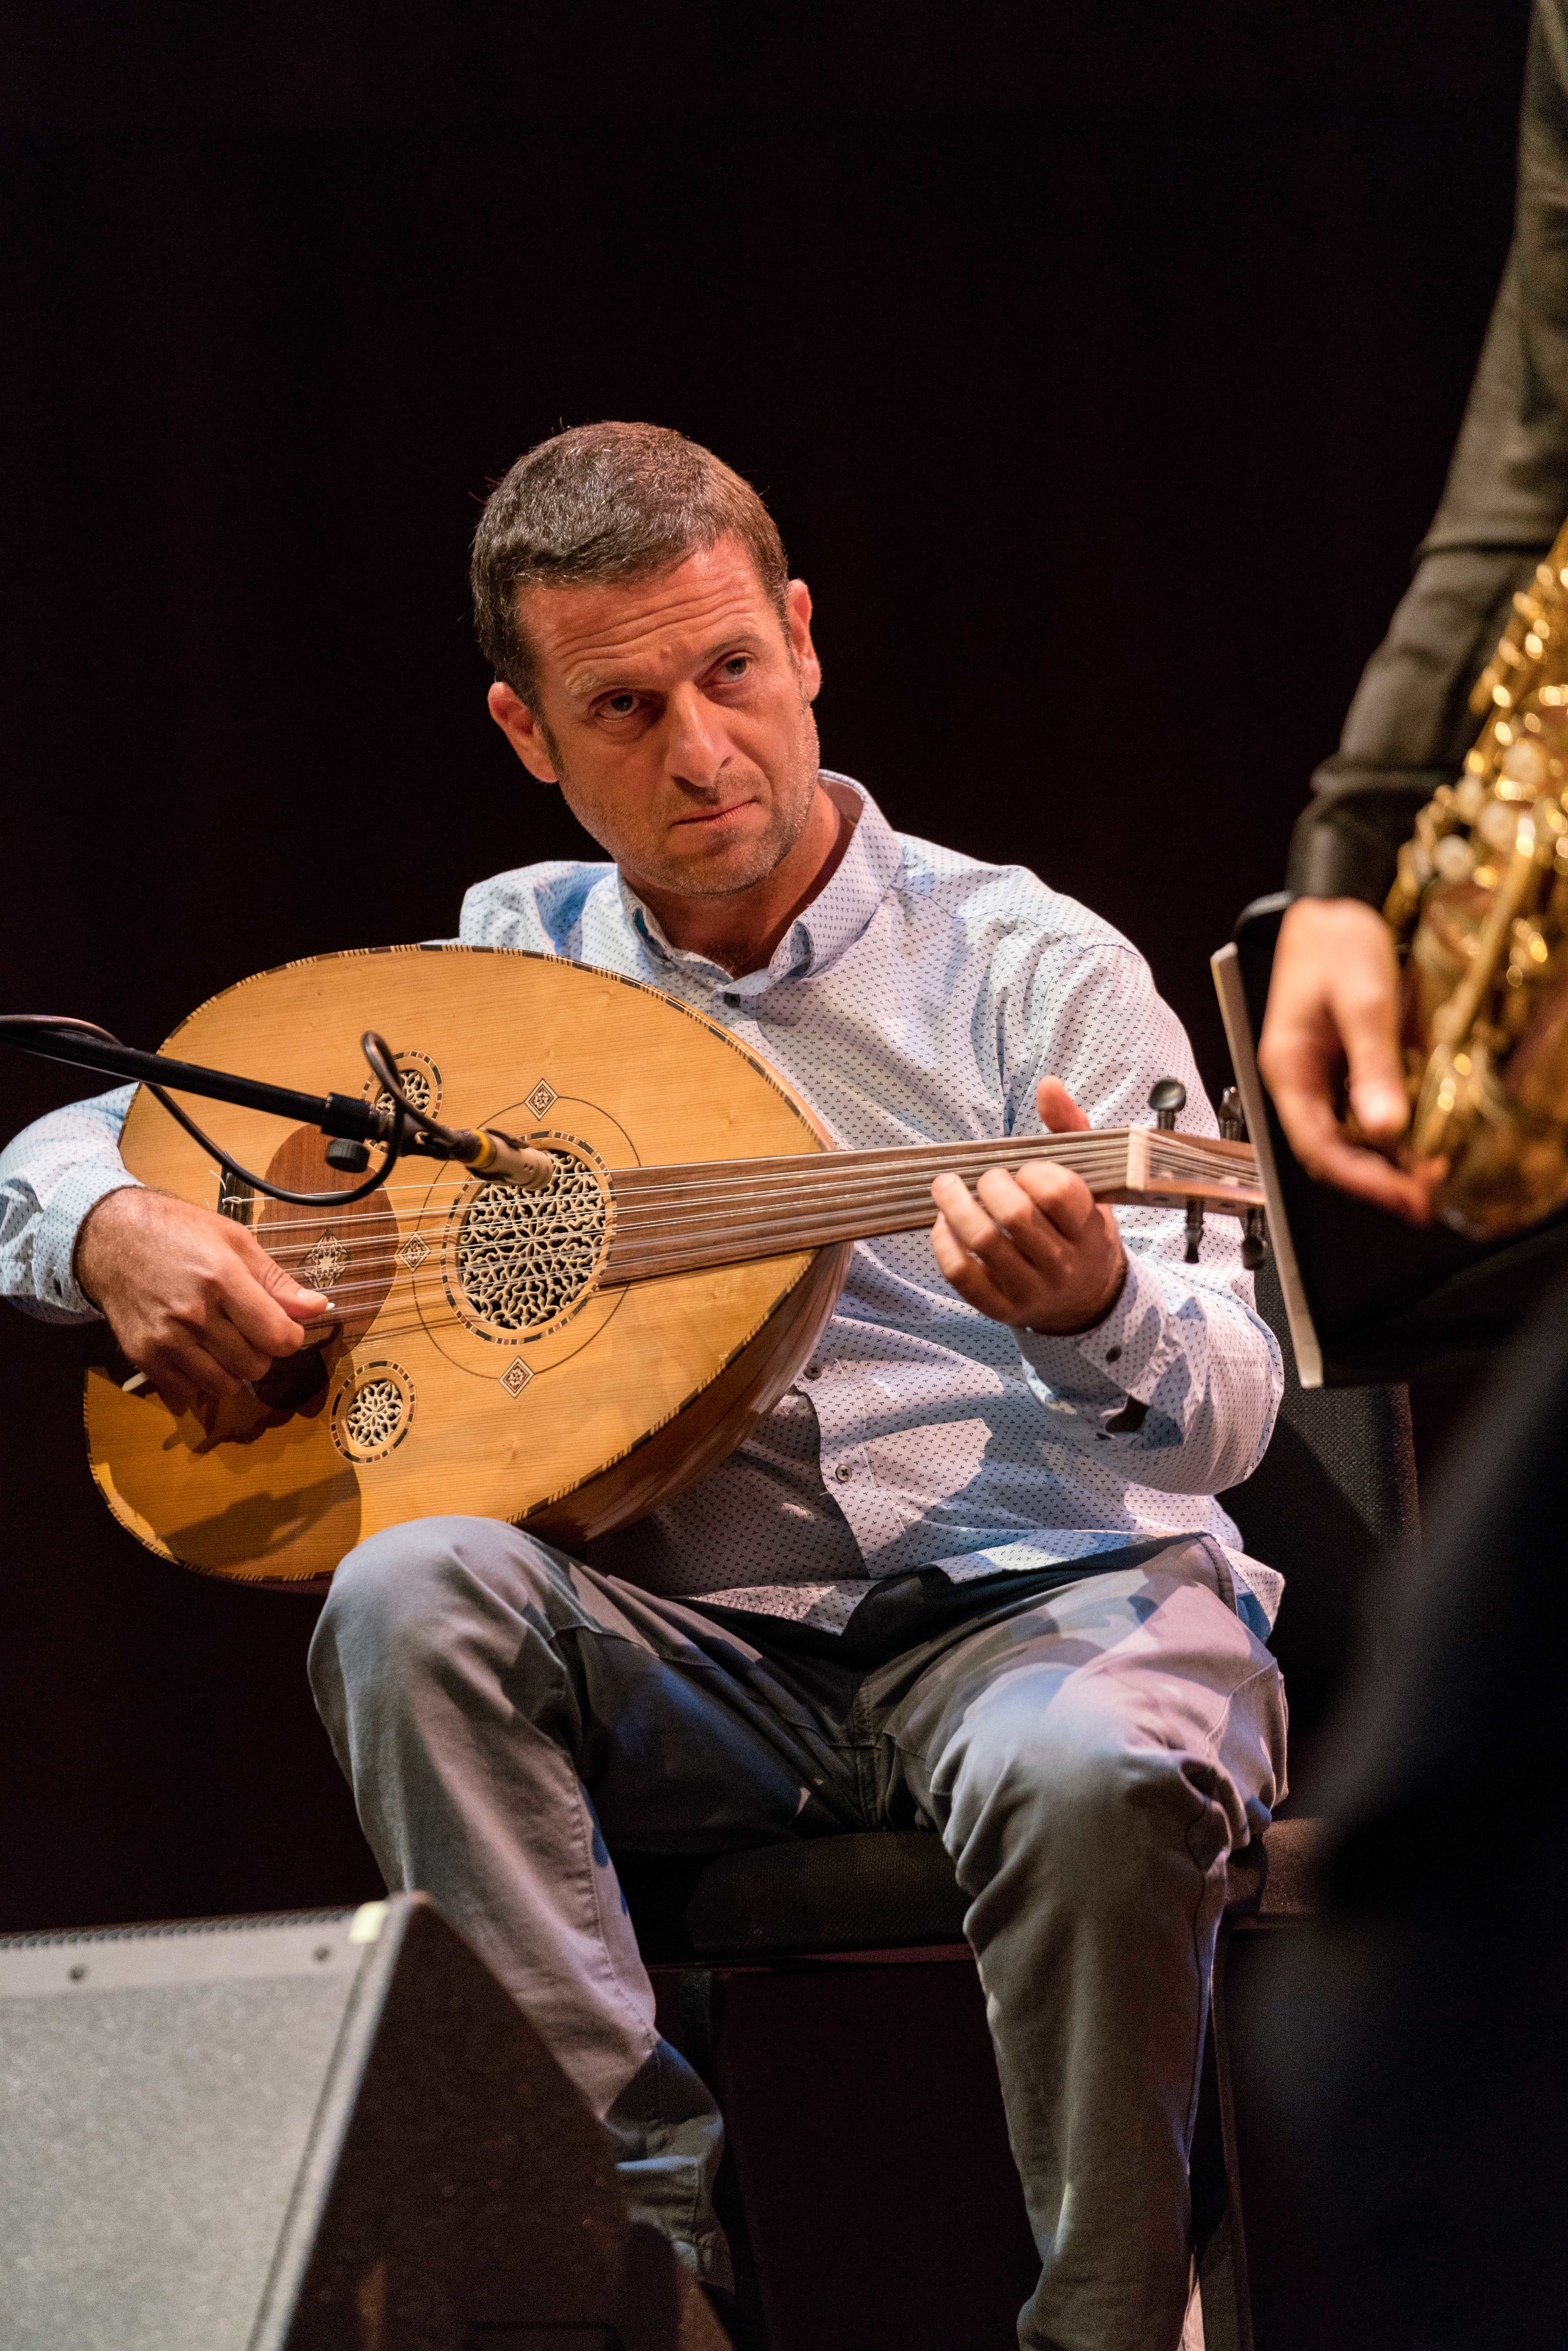 Tareq Abboushi on Buzuq (Long-neck Lute)